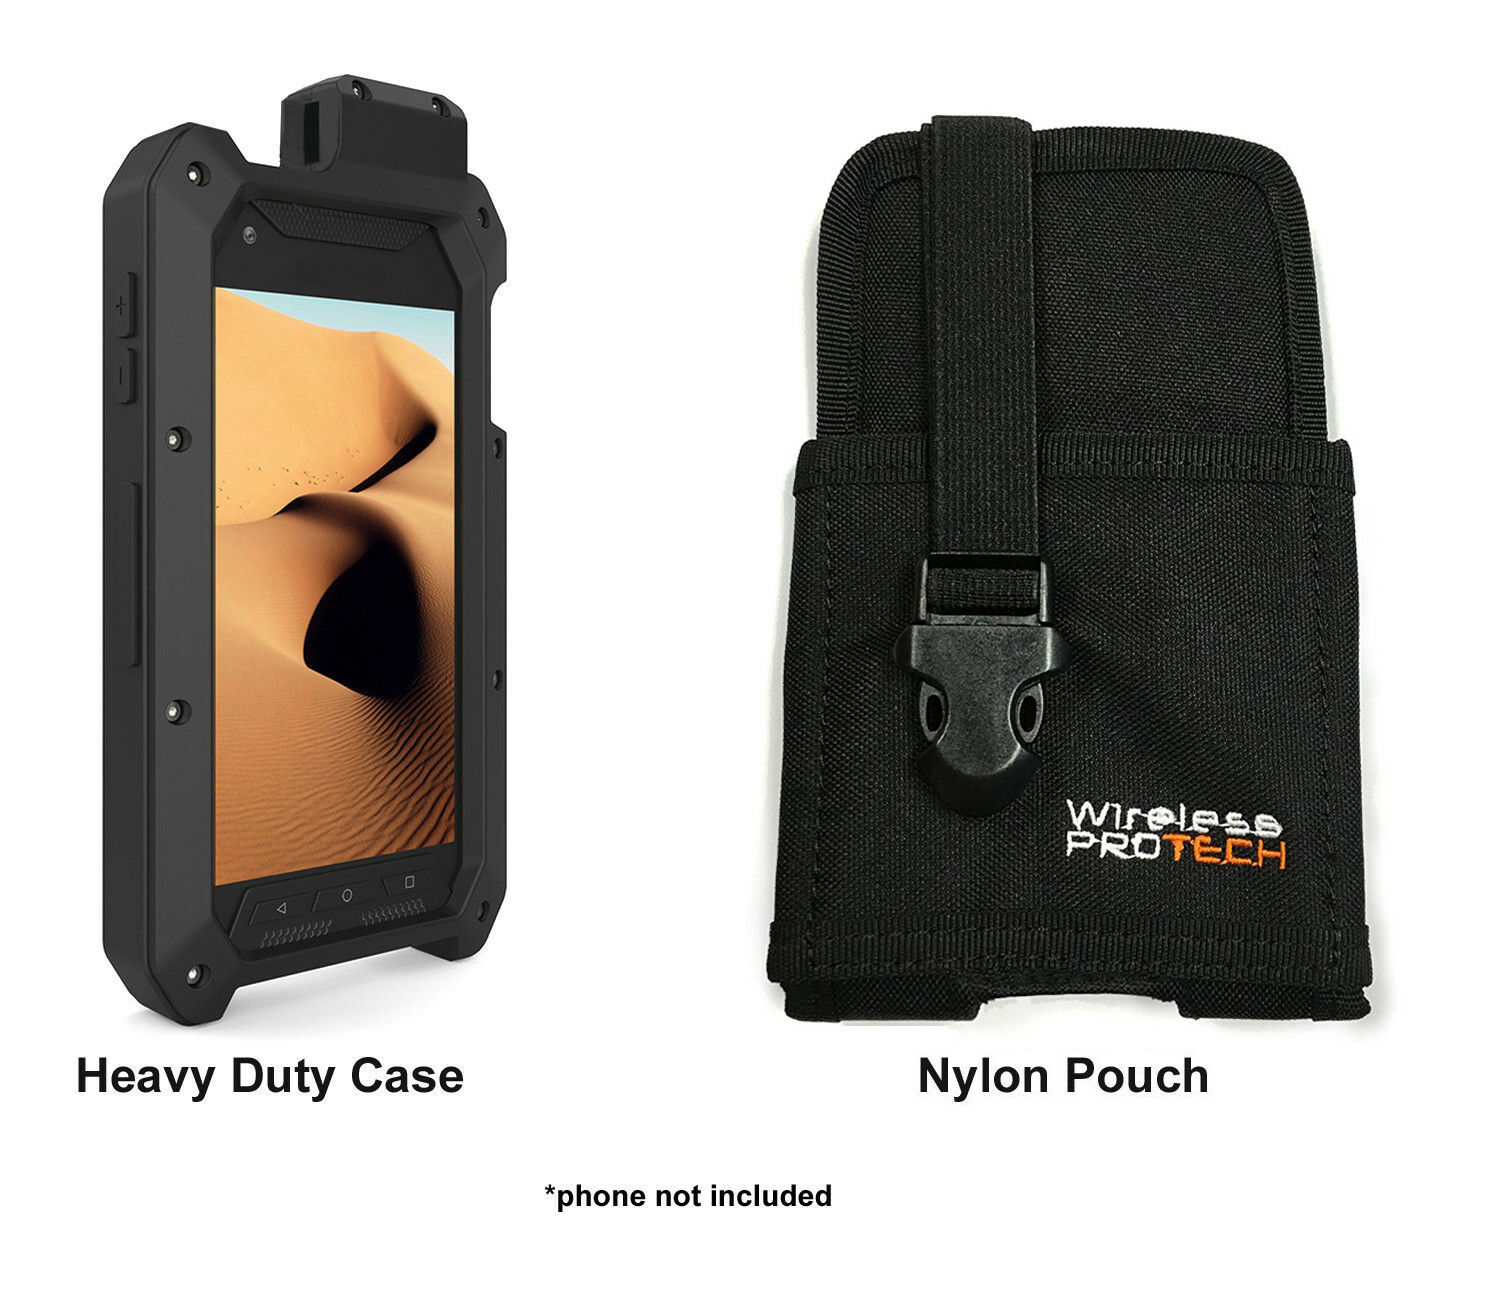 Kyocera DuraForce Pro Heavy Duty Case / Rugged Nylon Pouch b